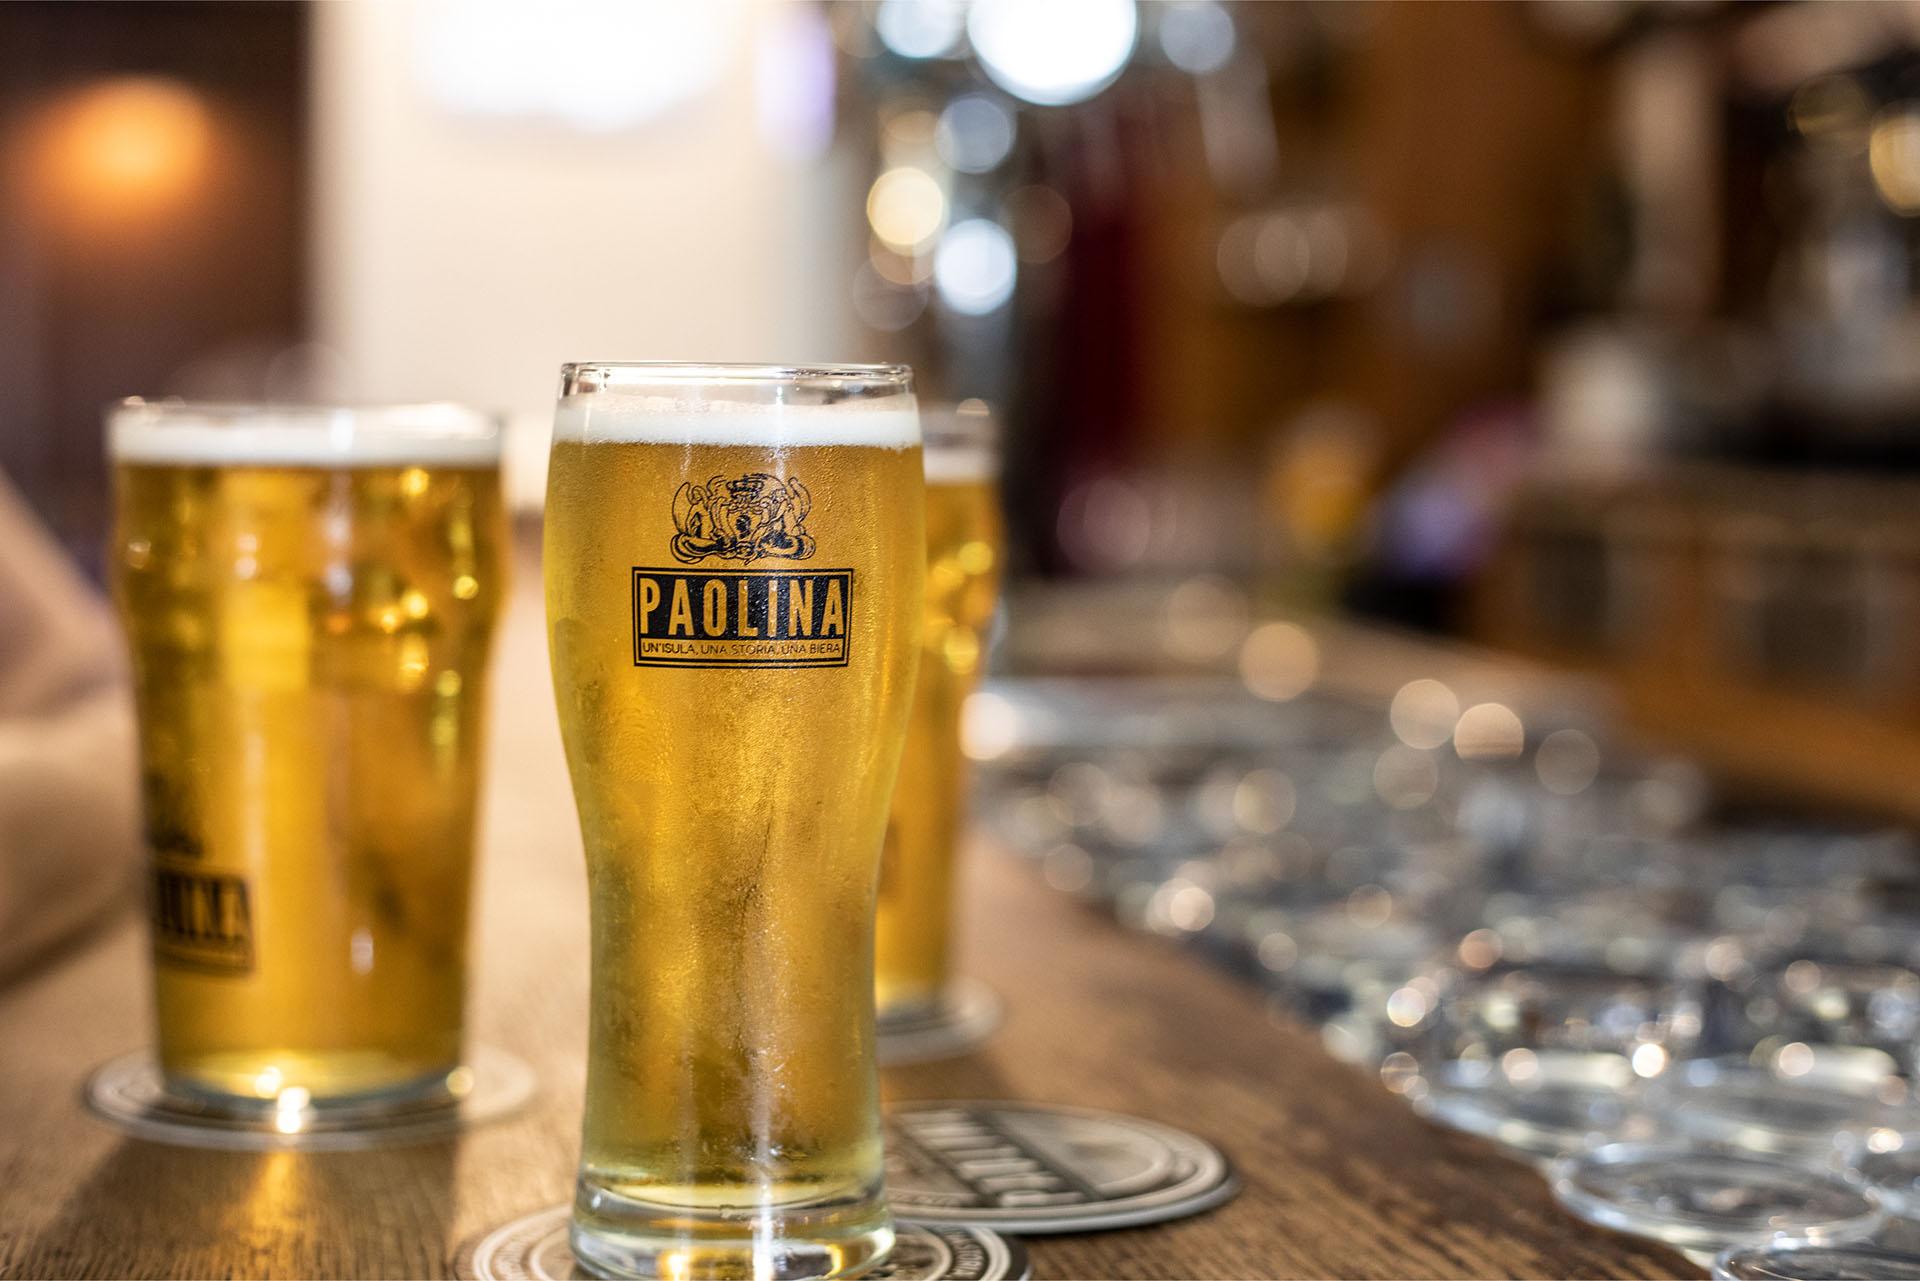 Bière paolina pression